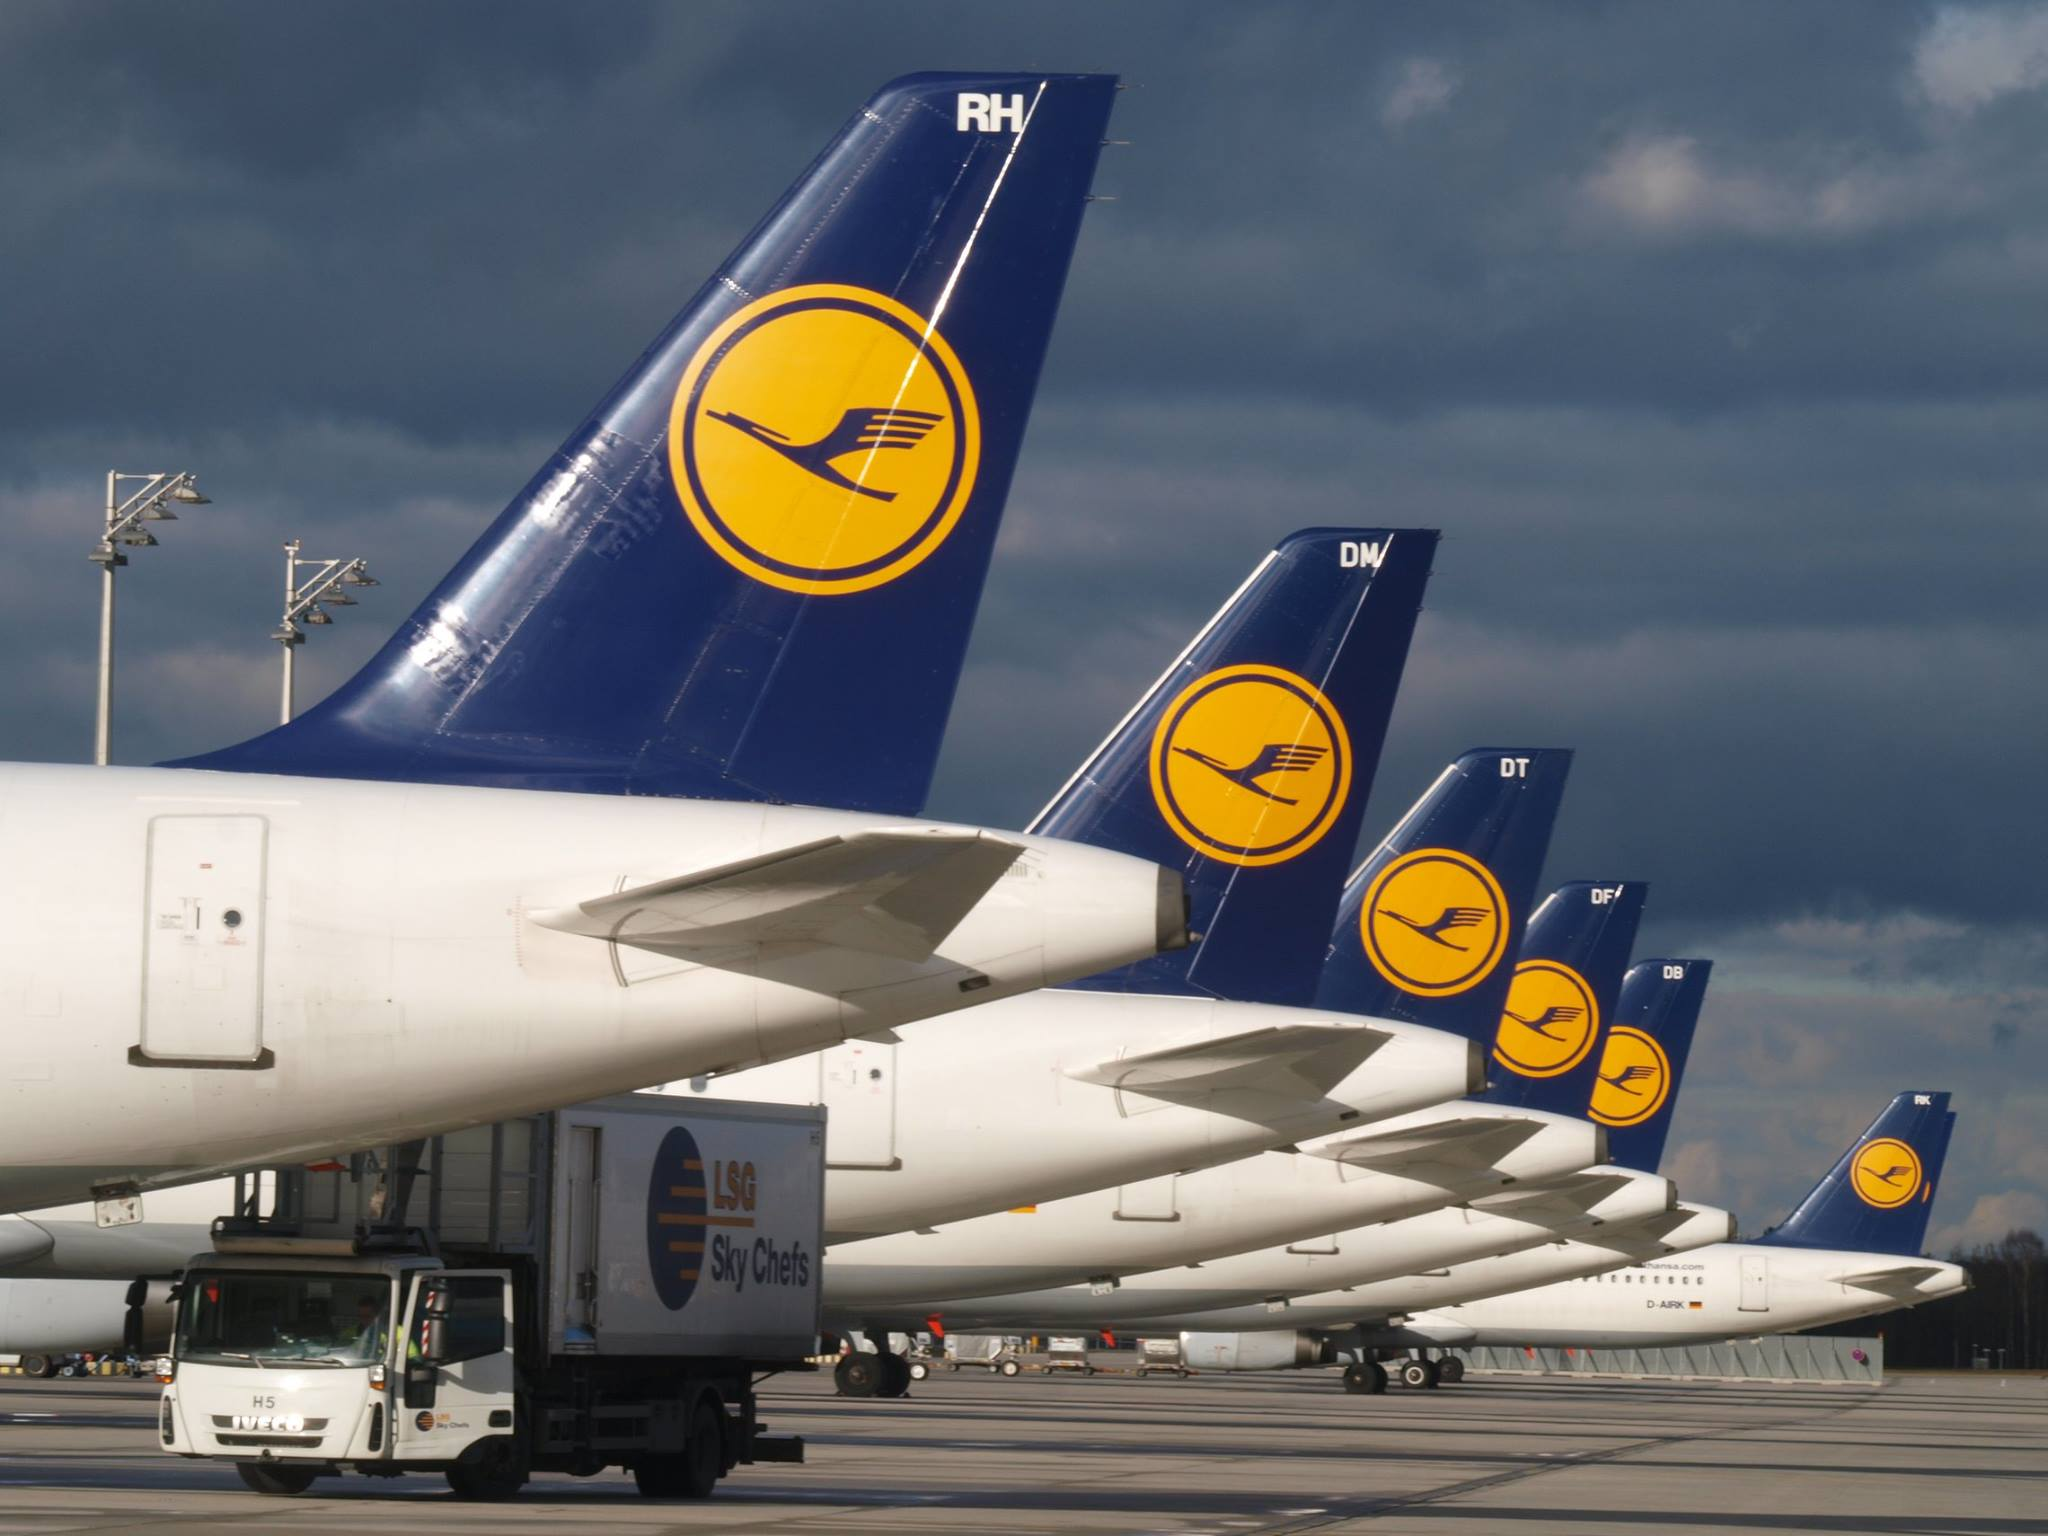 A Lufthansa repülőgépei a müncheni repülőtéren. (Fotó) Munich Airport) | © AIRportal.hu